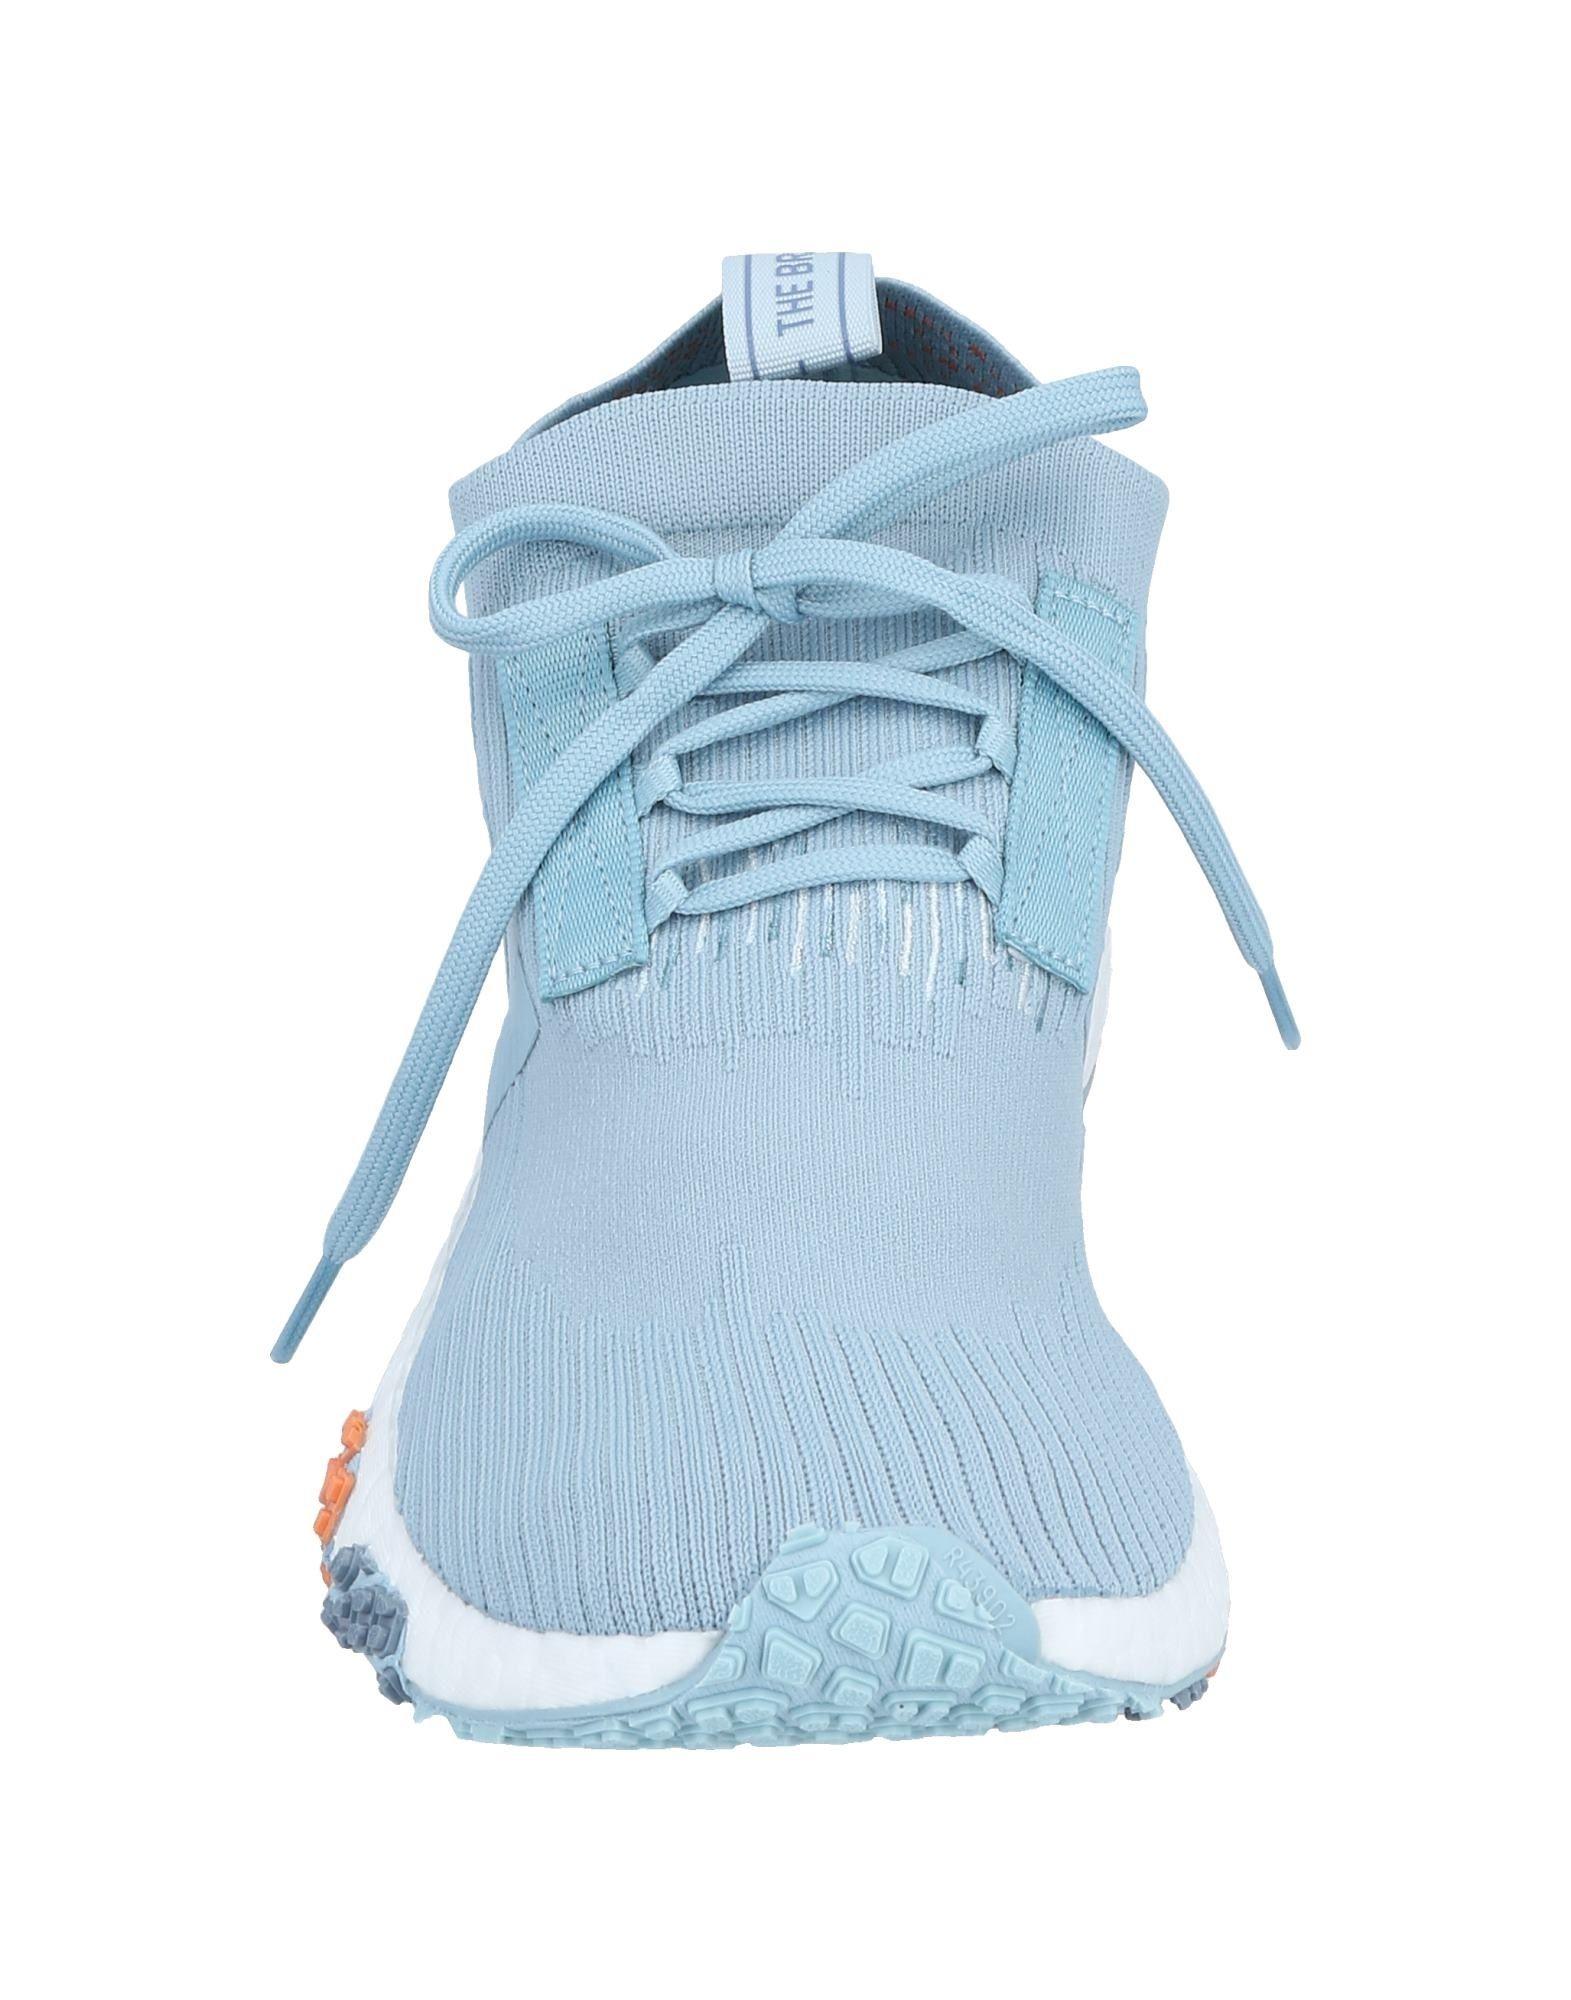 adidas originaux baskets - hommes adidas originaux originaux adidas des baskets en ligne sur l'australie - 11587899kv d36cd1